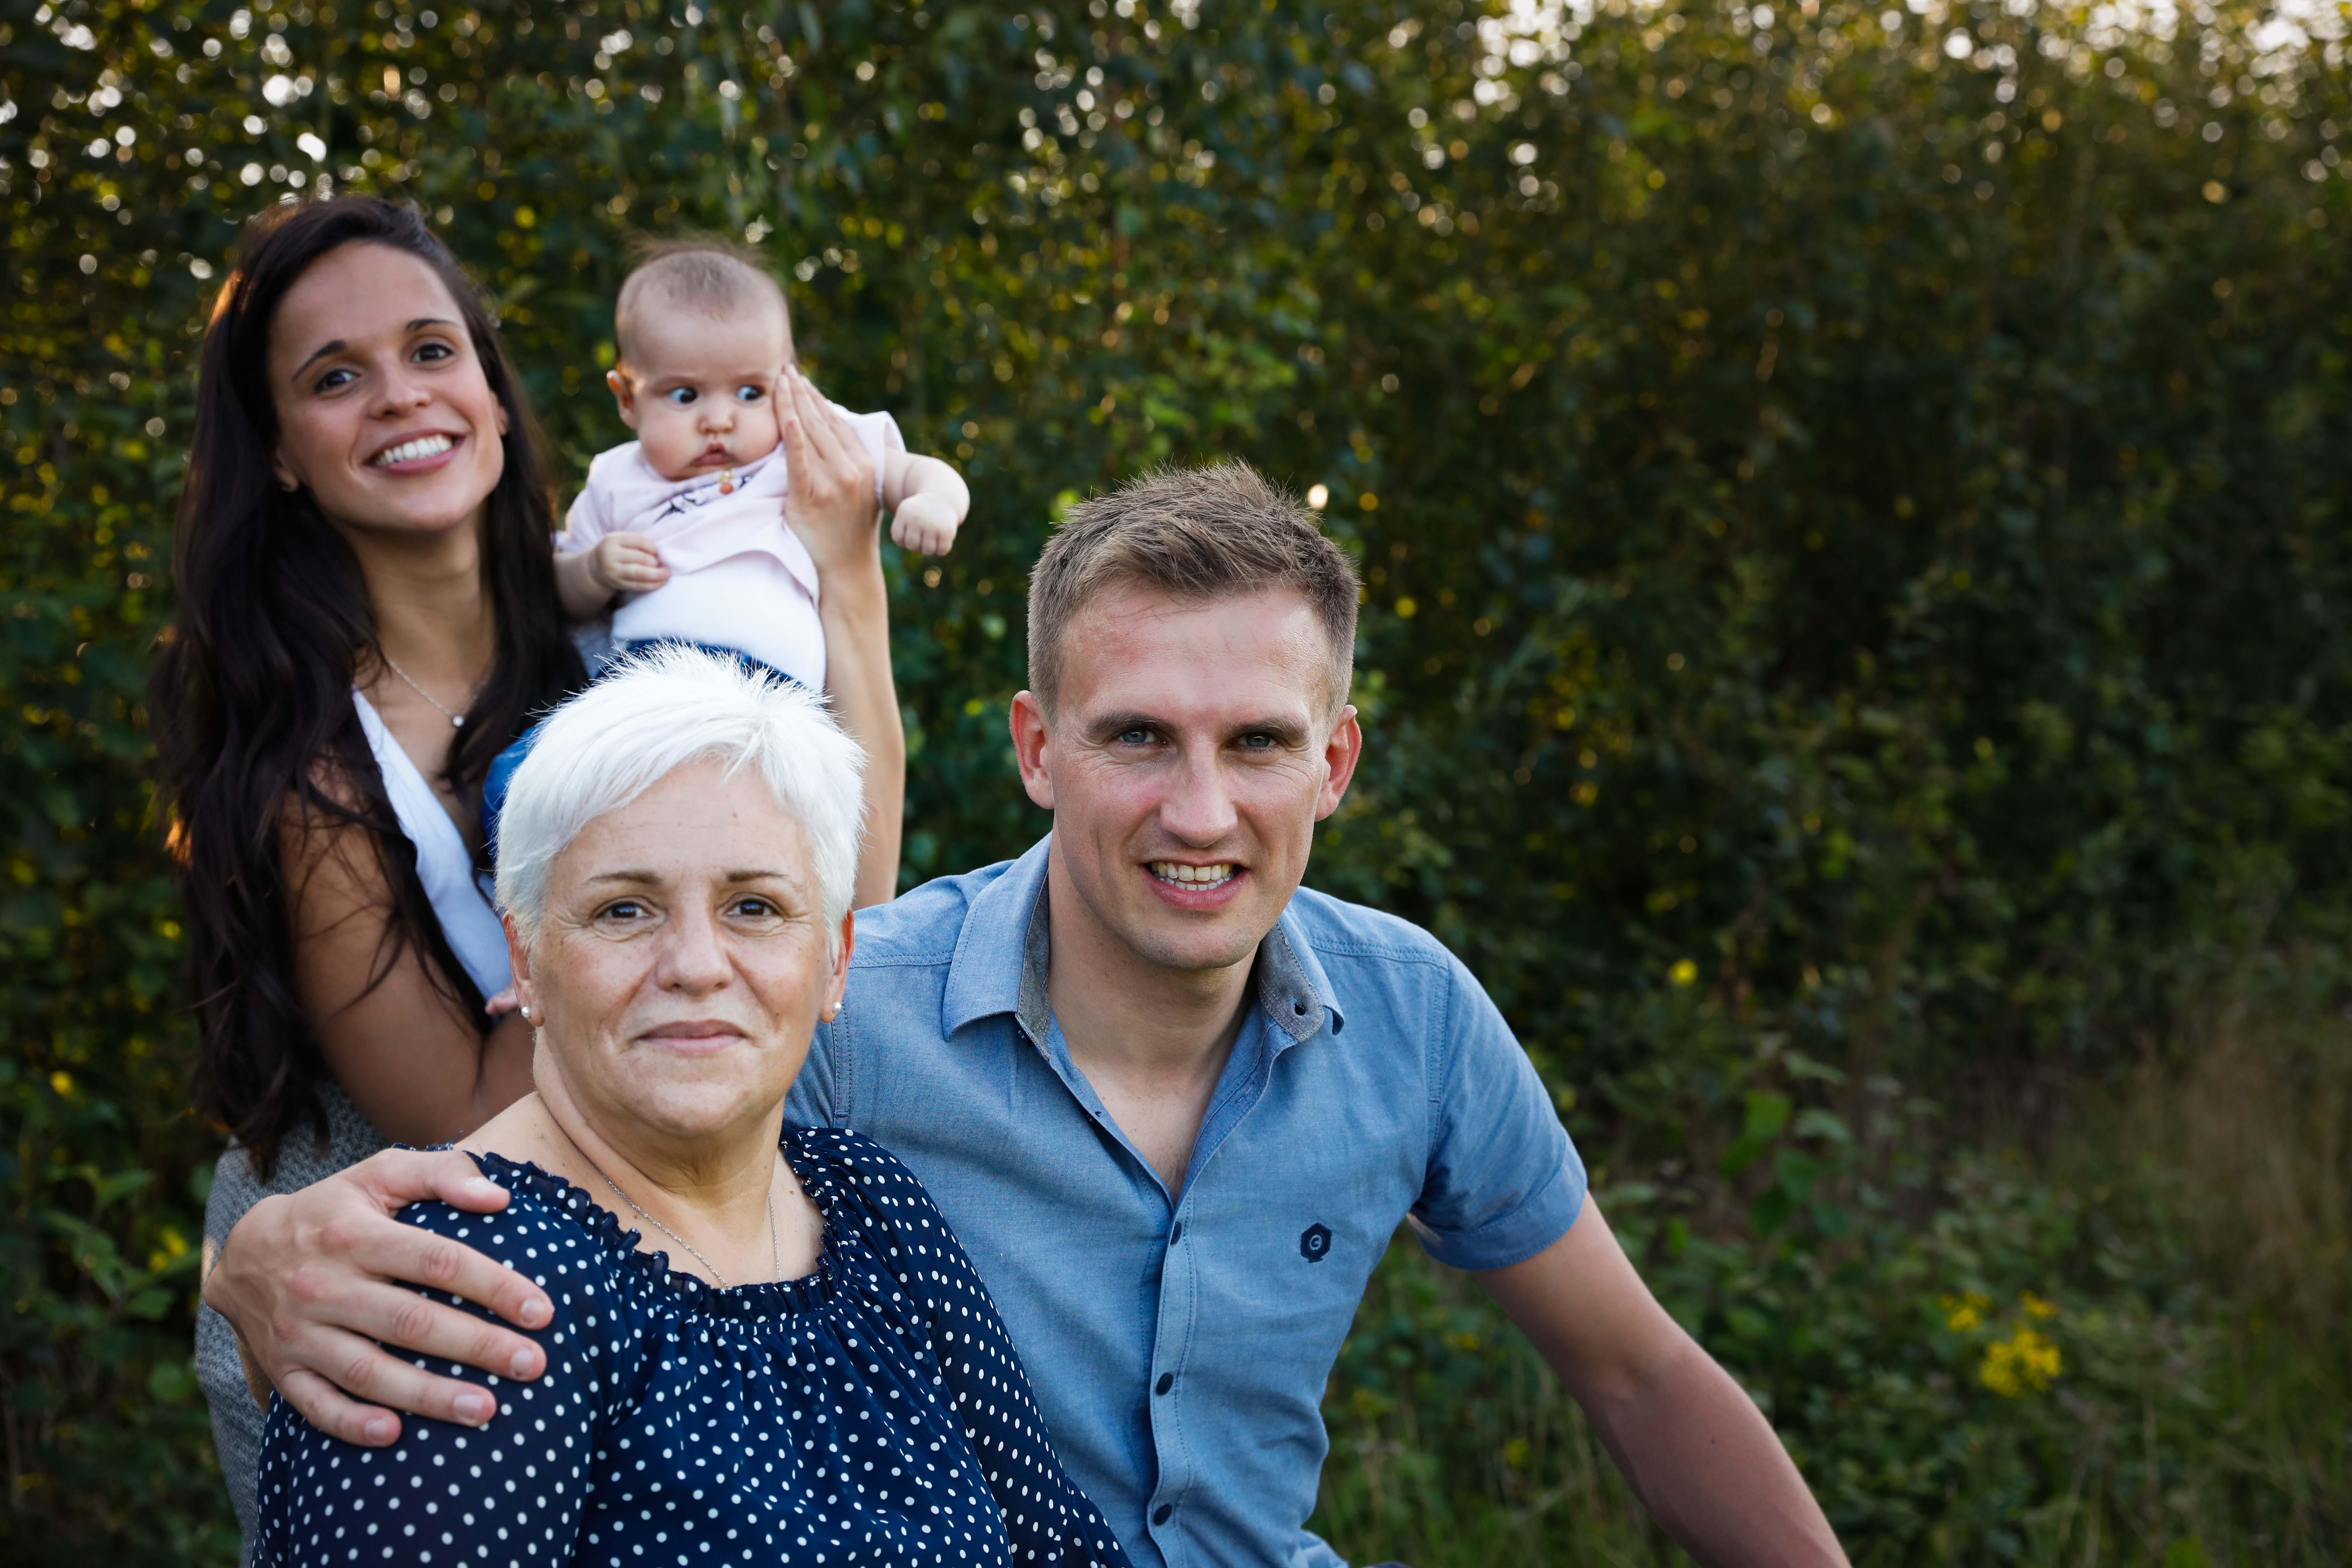 claudialeclercq-familyphotography-photographiedefamille-fotografiafamilia-68